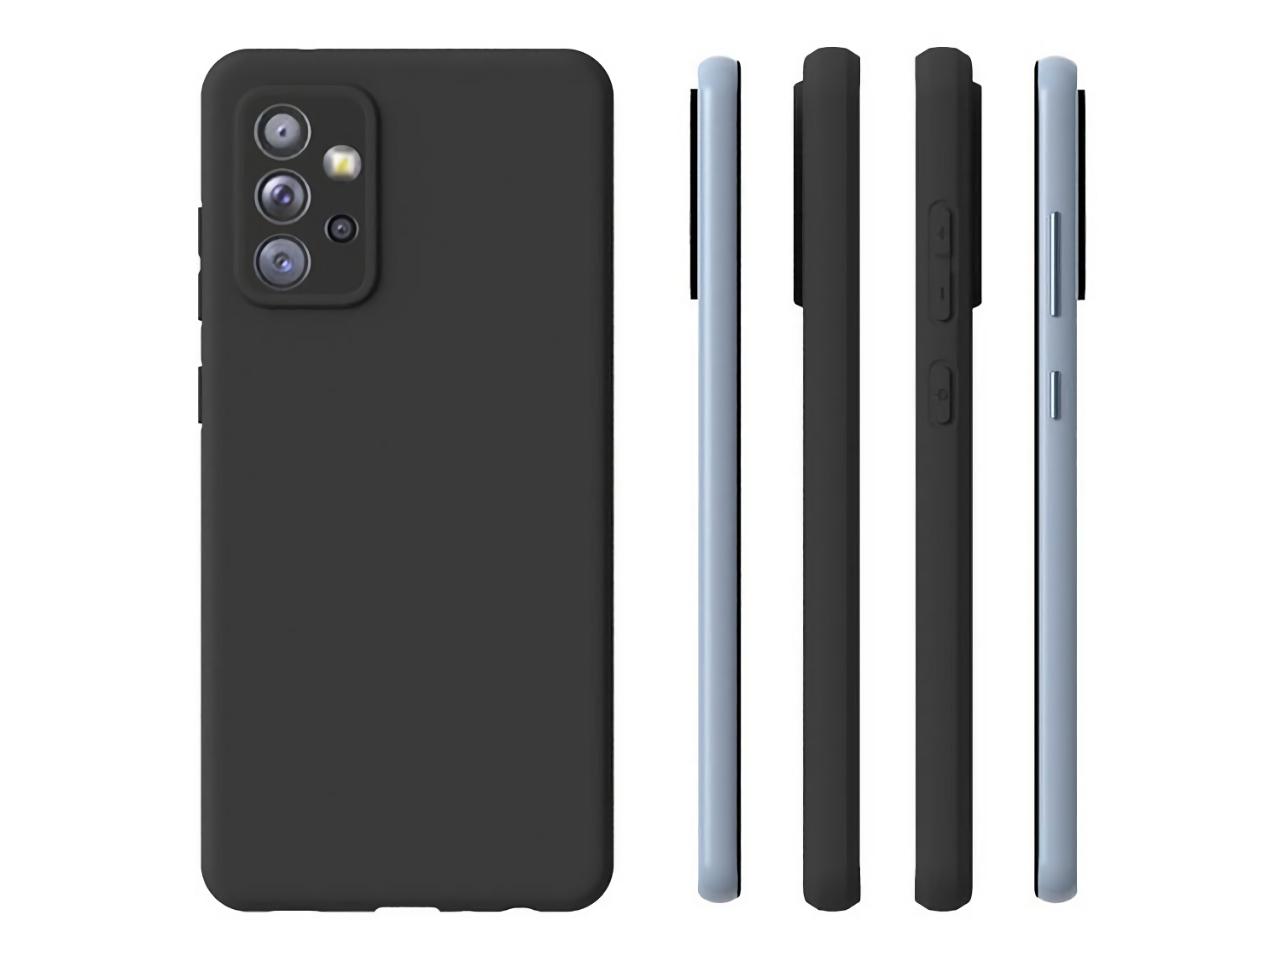 Samsung Galaxy A72 5G появился на рендерах: дисплей Infinity-O, квадро-камера и разъём для наушников